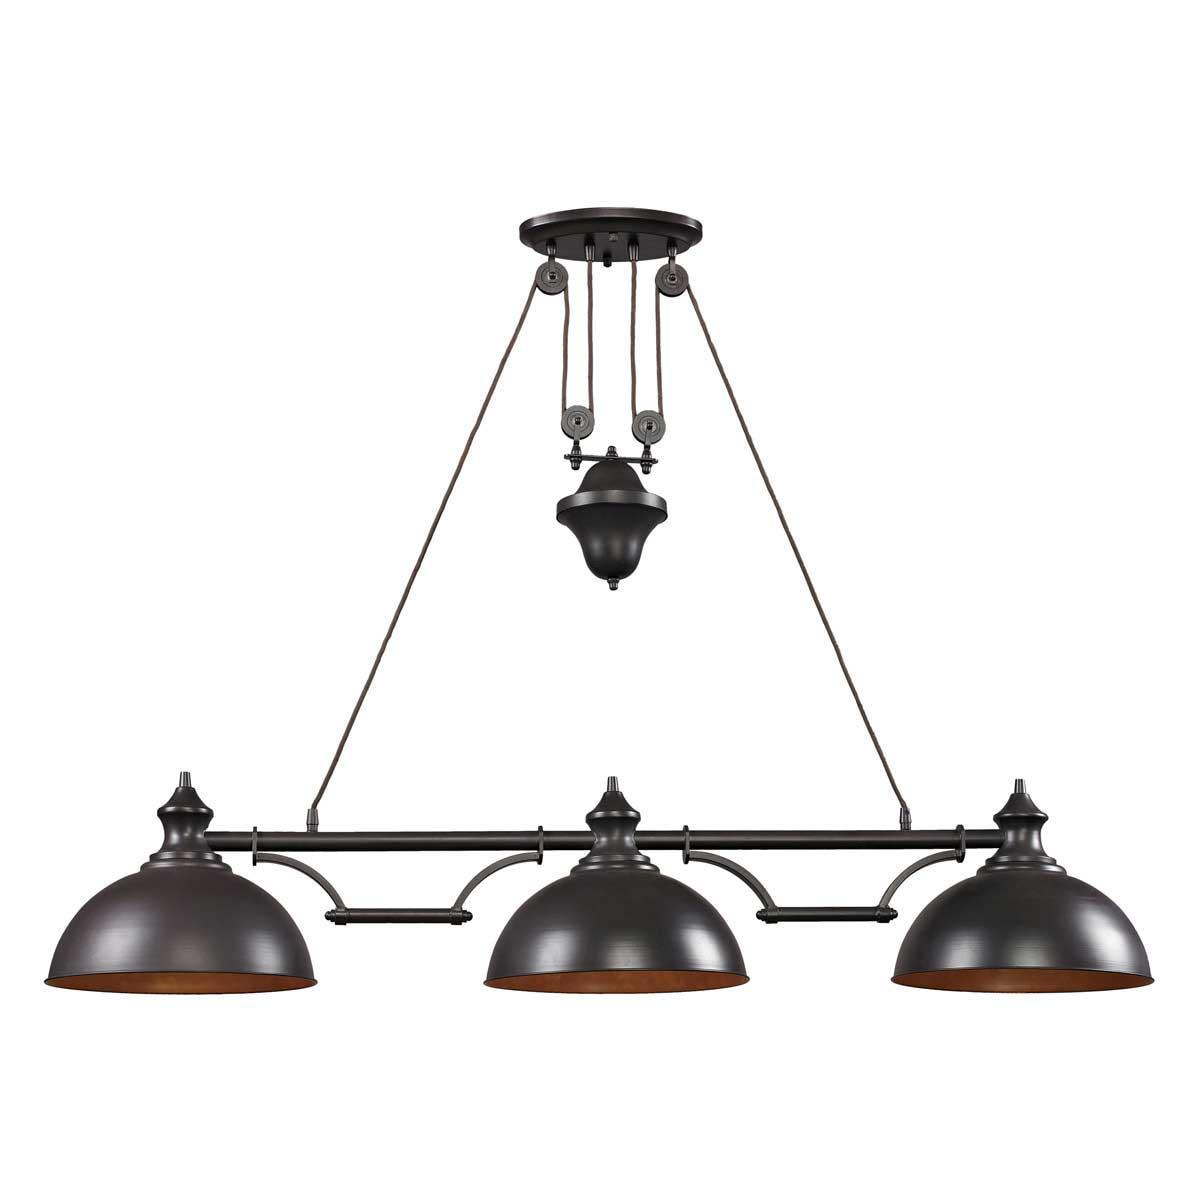 Farmhouse Linear Pendant Light By Elk Lighting 65151 3